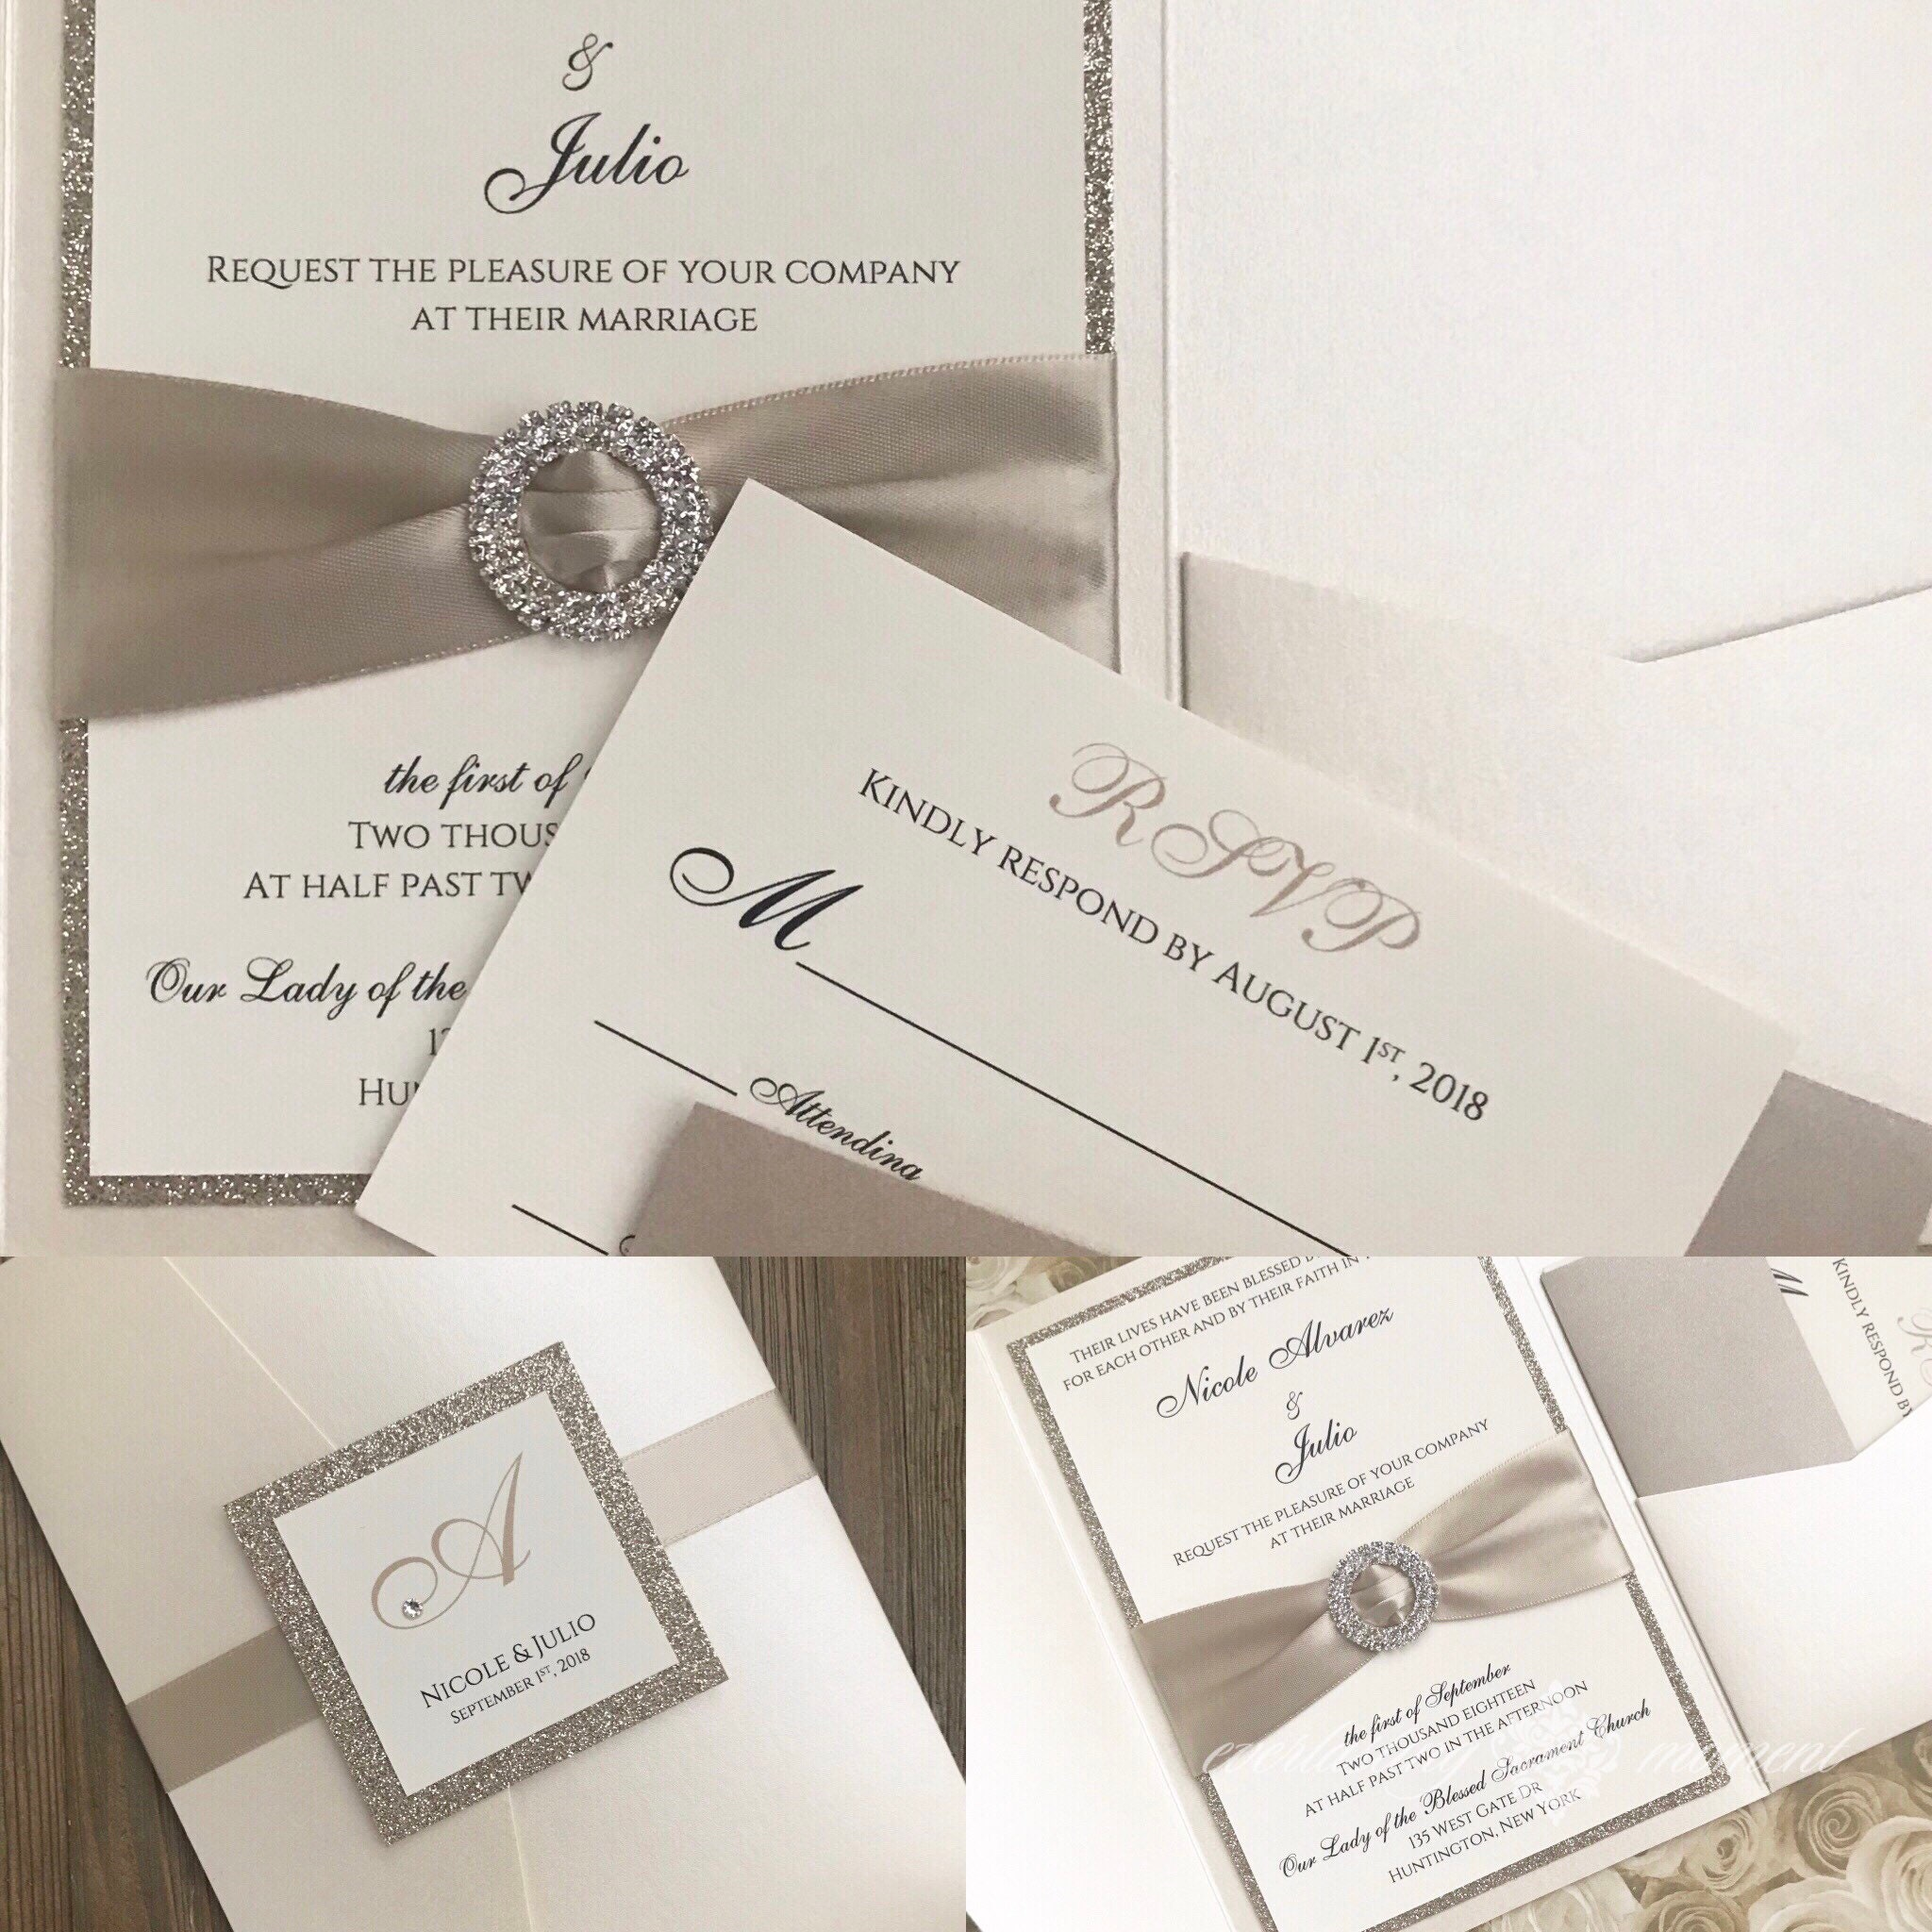 Wedding Invitation Pocket Folders: Rhinestone Pocket Folder Wedding Invitation Elegant